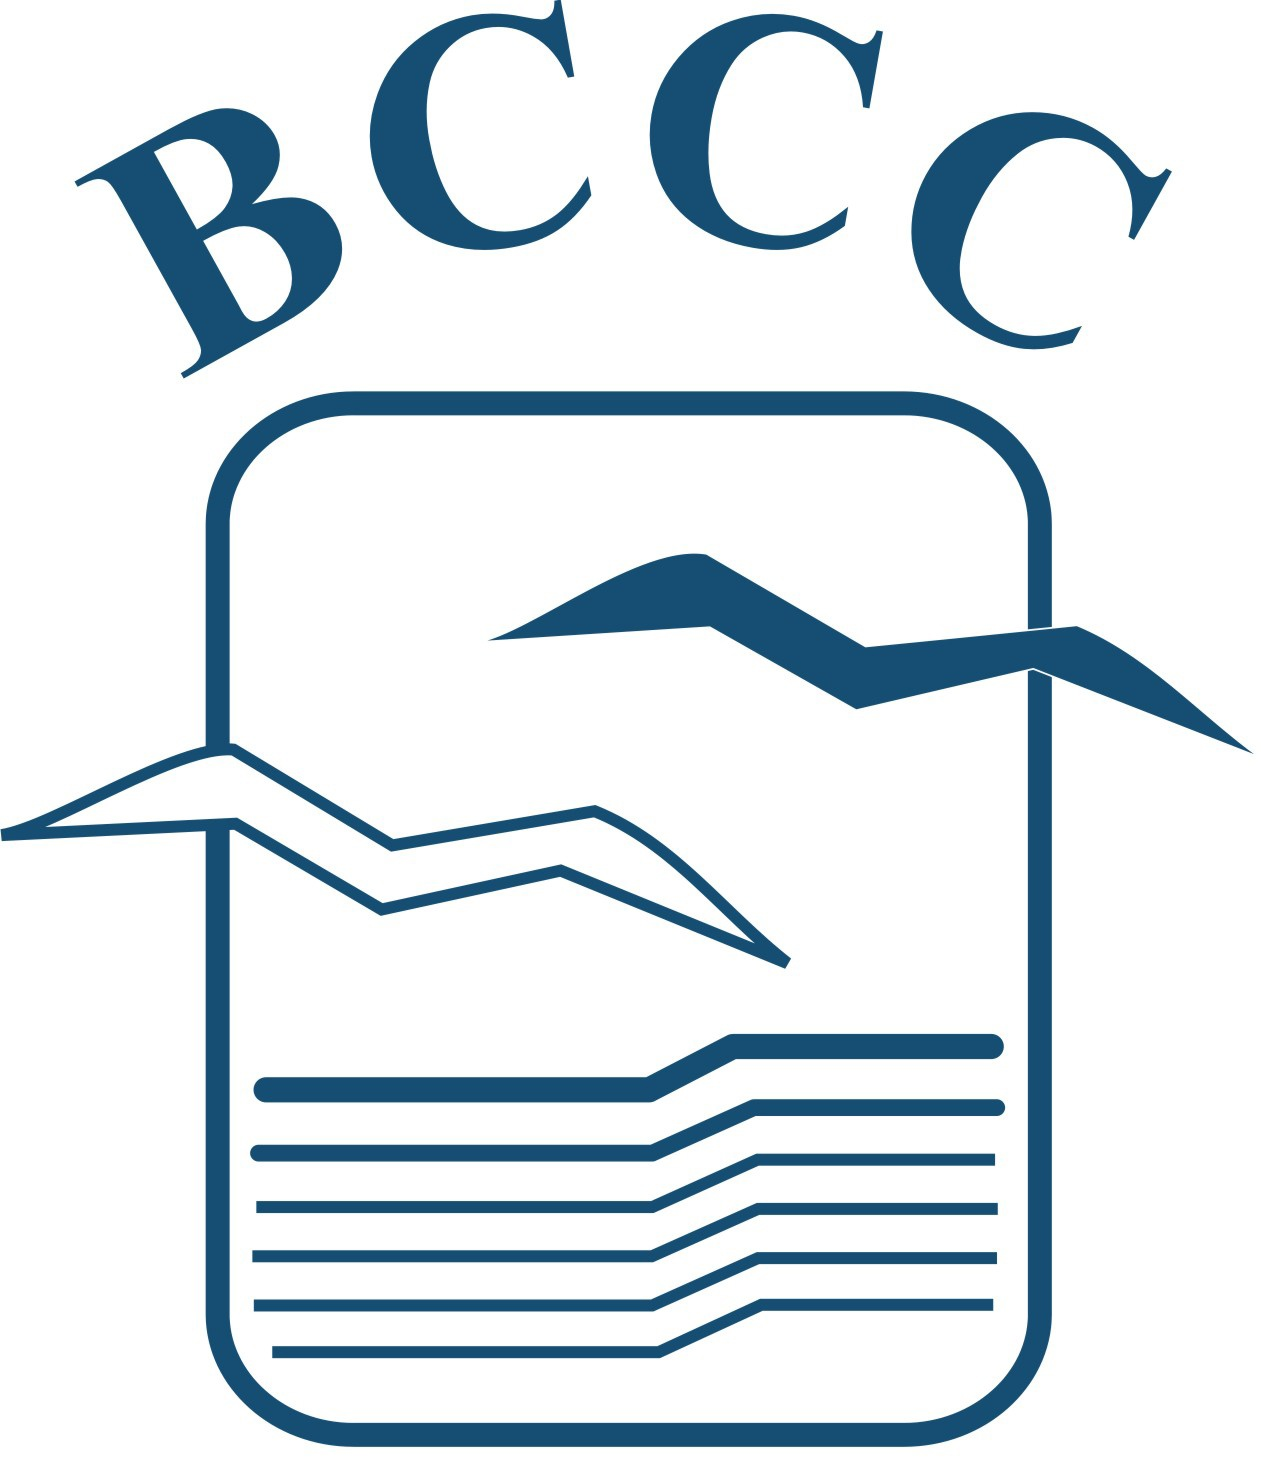 BCCC Gulls Logo in Blue.jpg